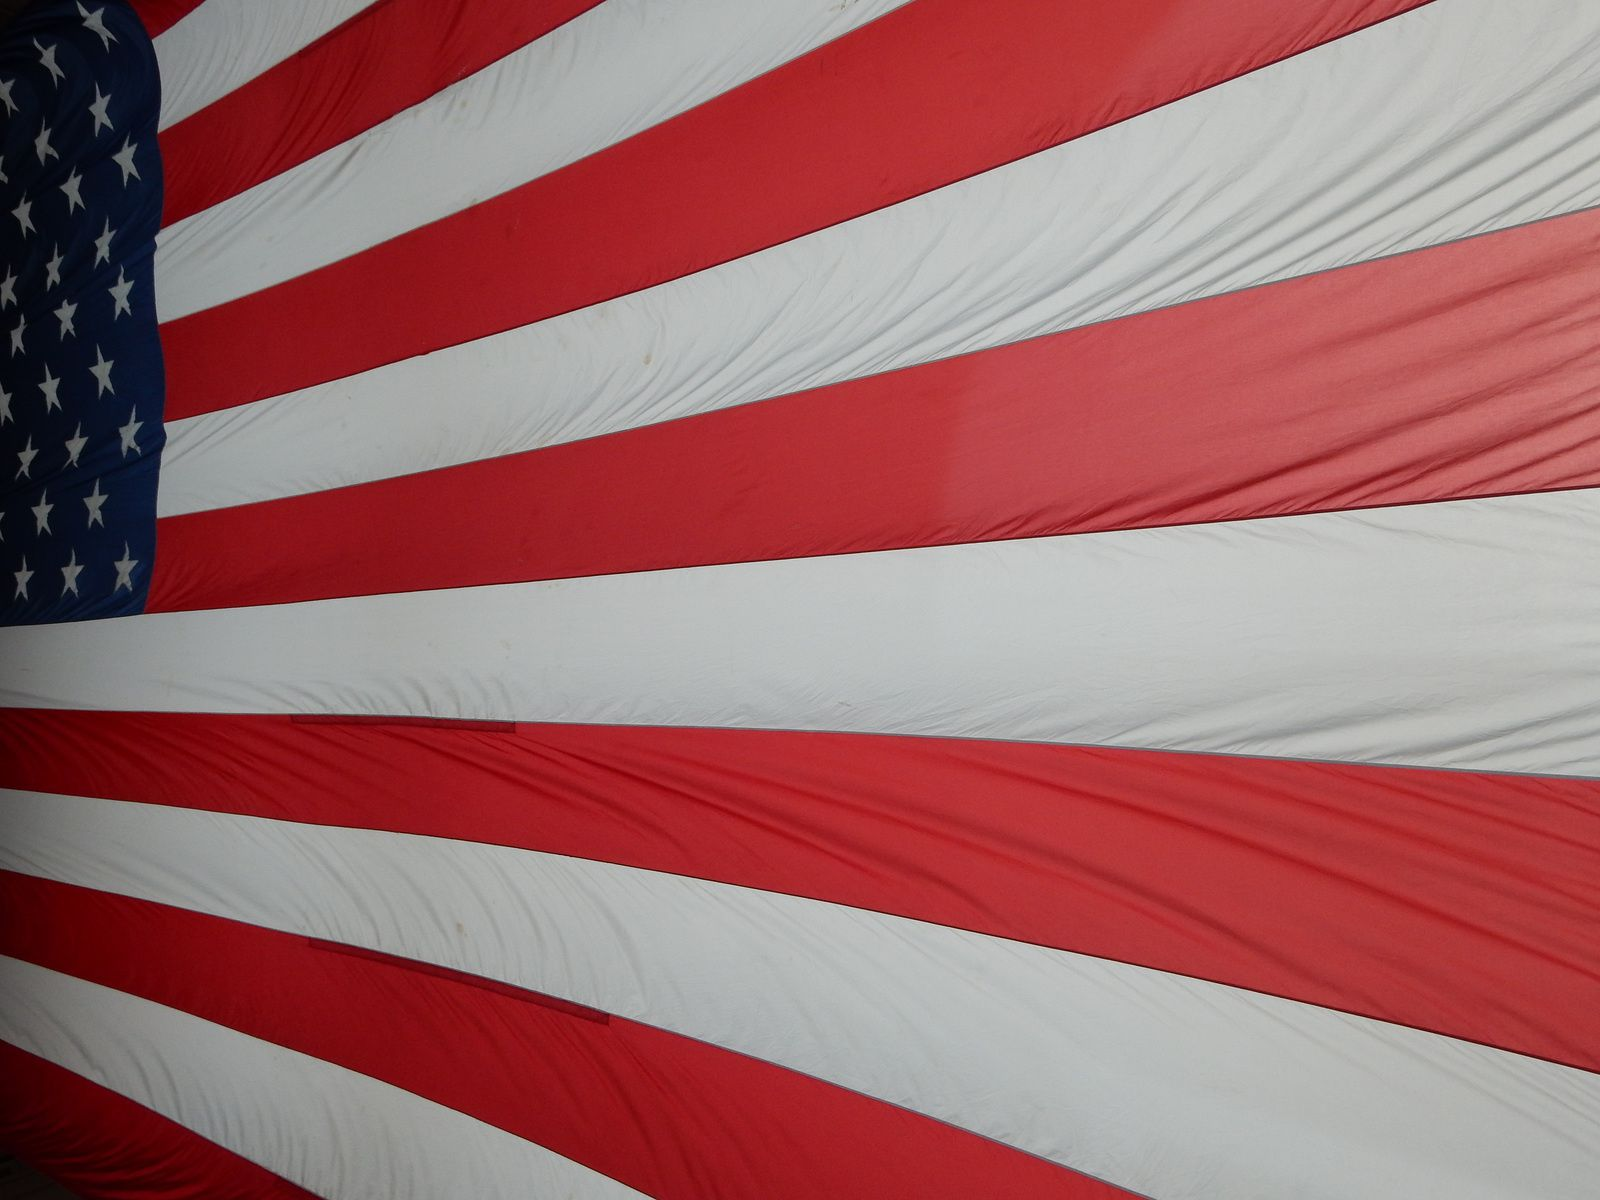 Flags, Boston - Septembre 2014